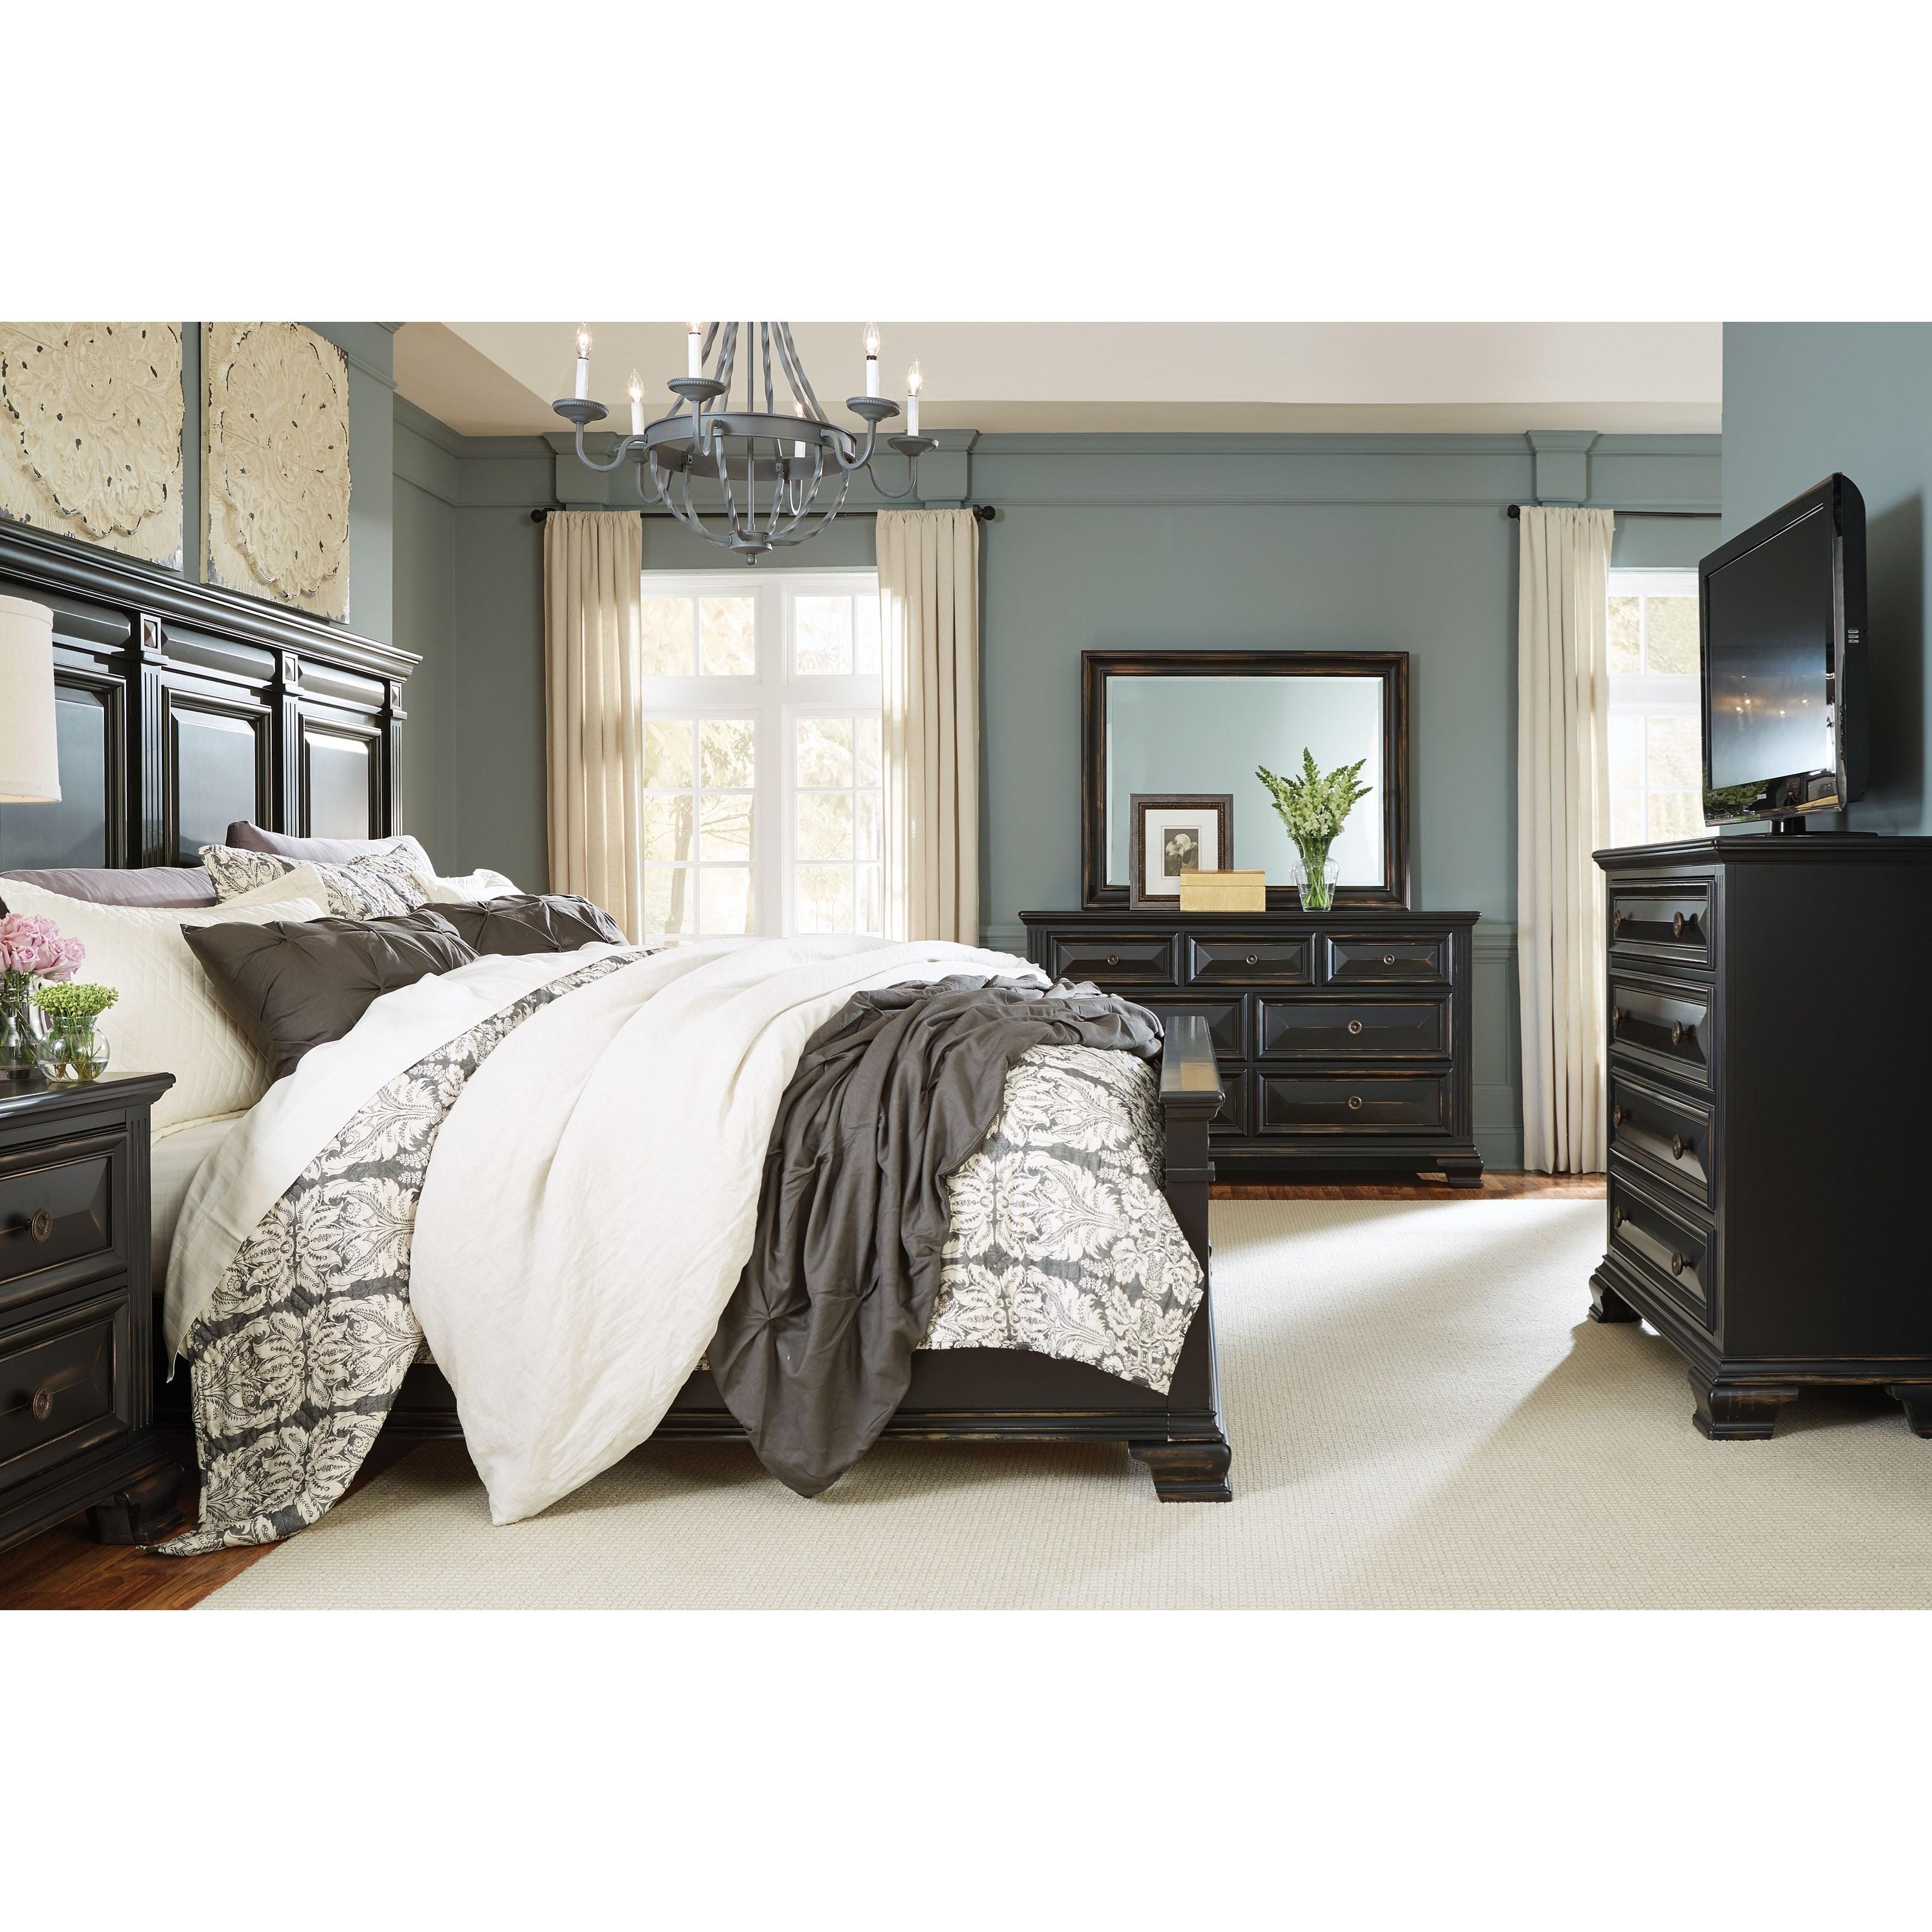 Beau Standard Furniture Passages King Bedroom Group